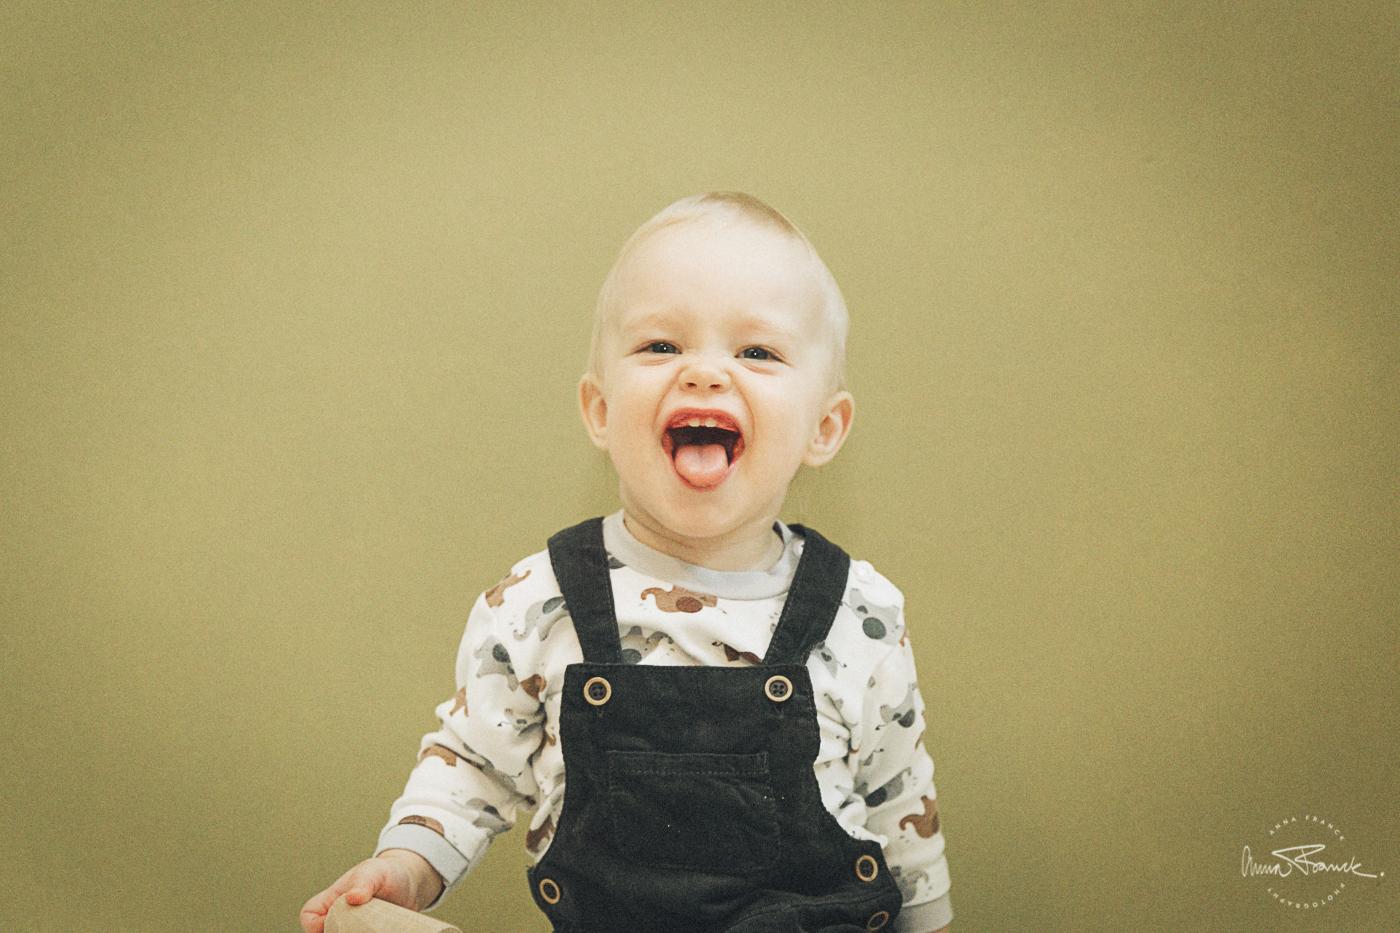 anna, franck, photography, porträtt, muotokuva, lapsikuvaus, barnfotografering, åbo, turku, stockholm, portraitphotography, children, onlocation